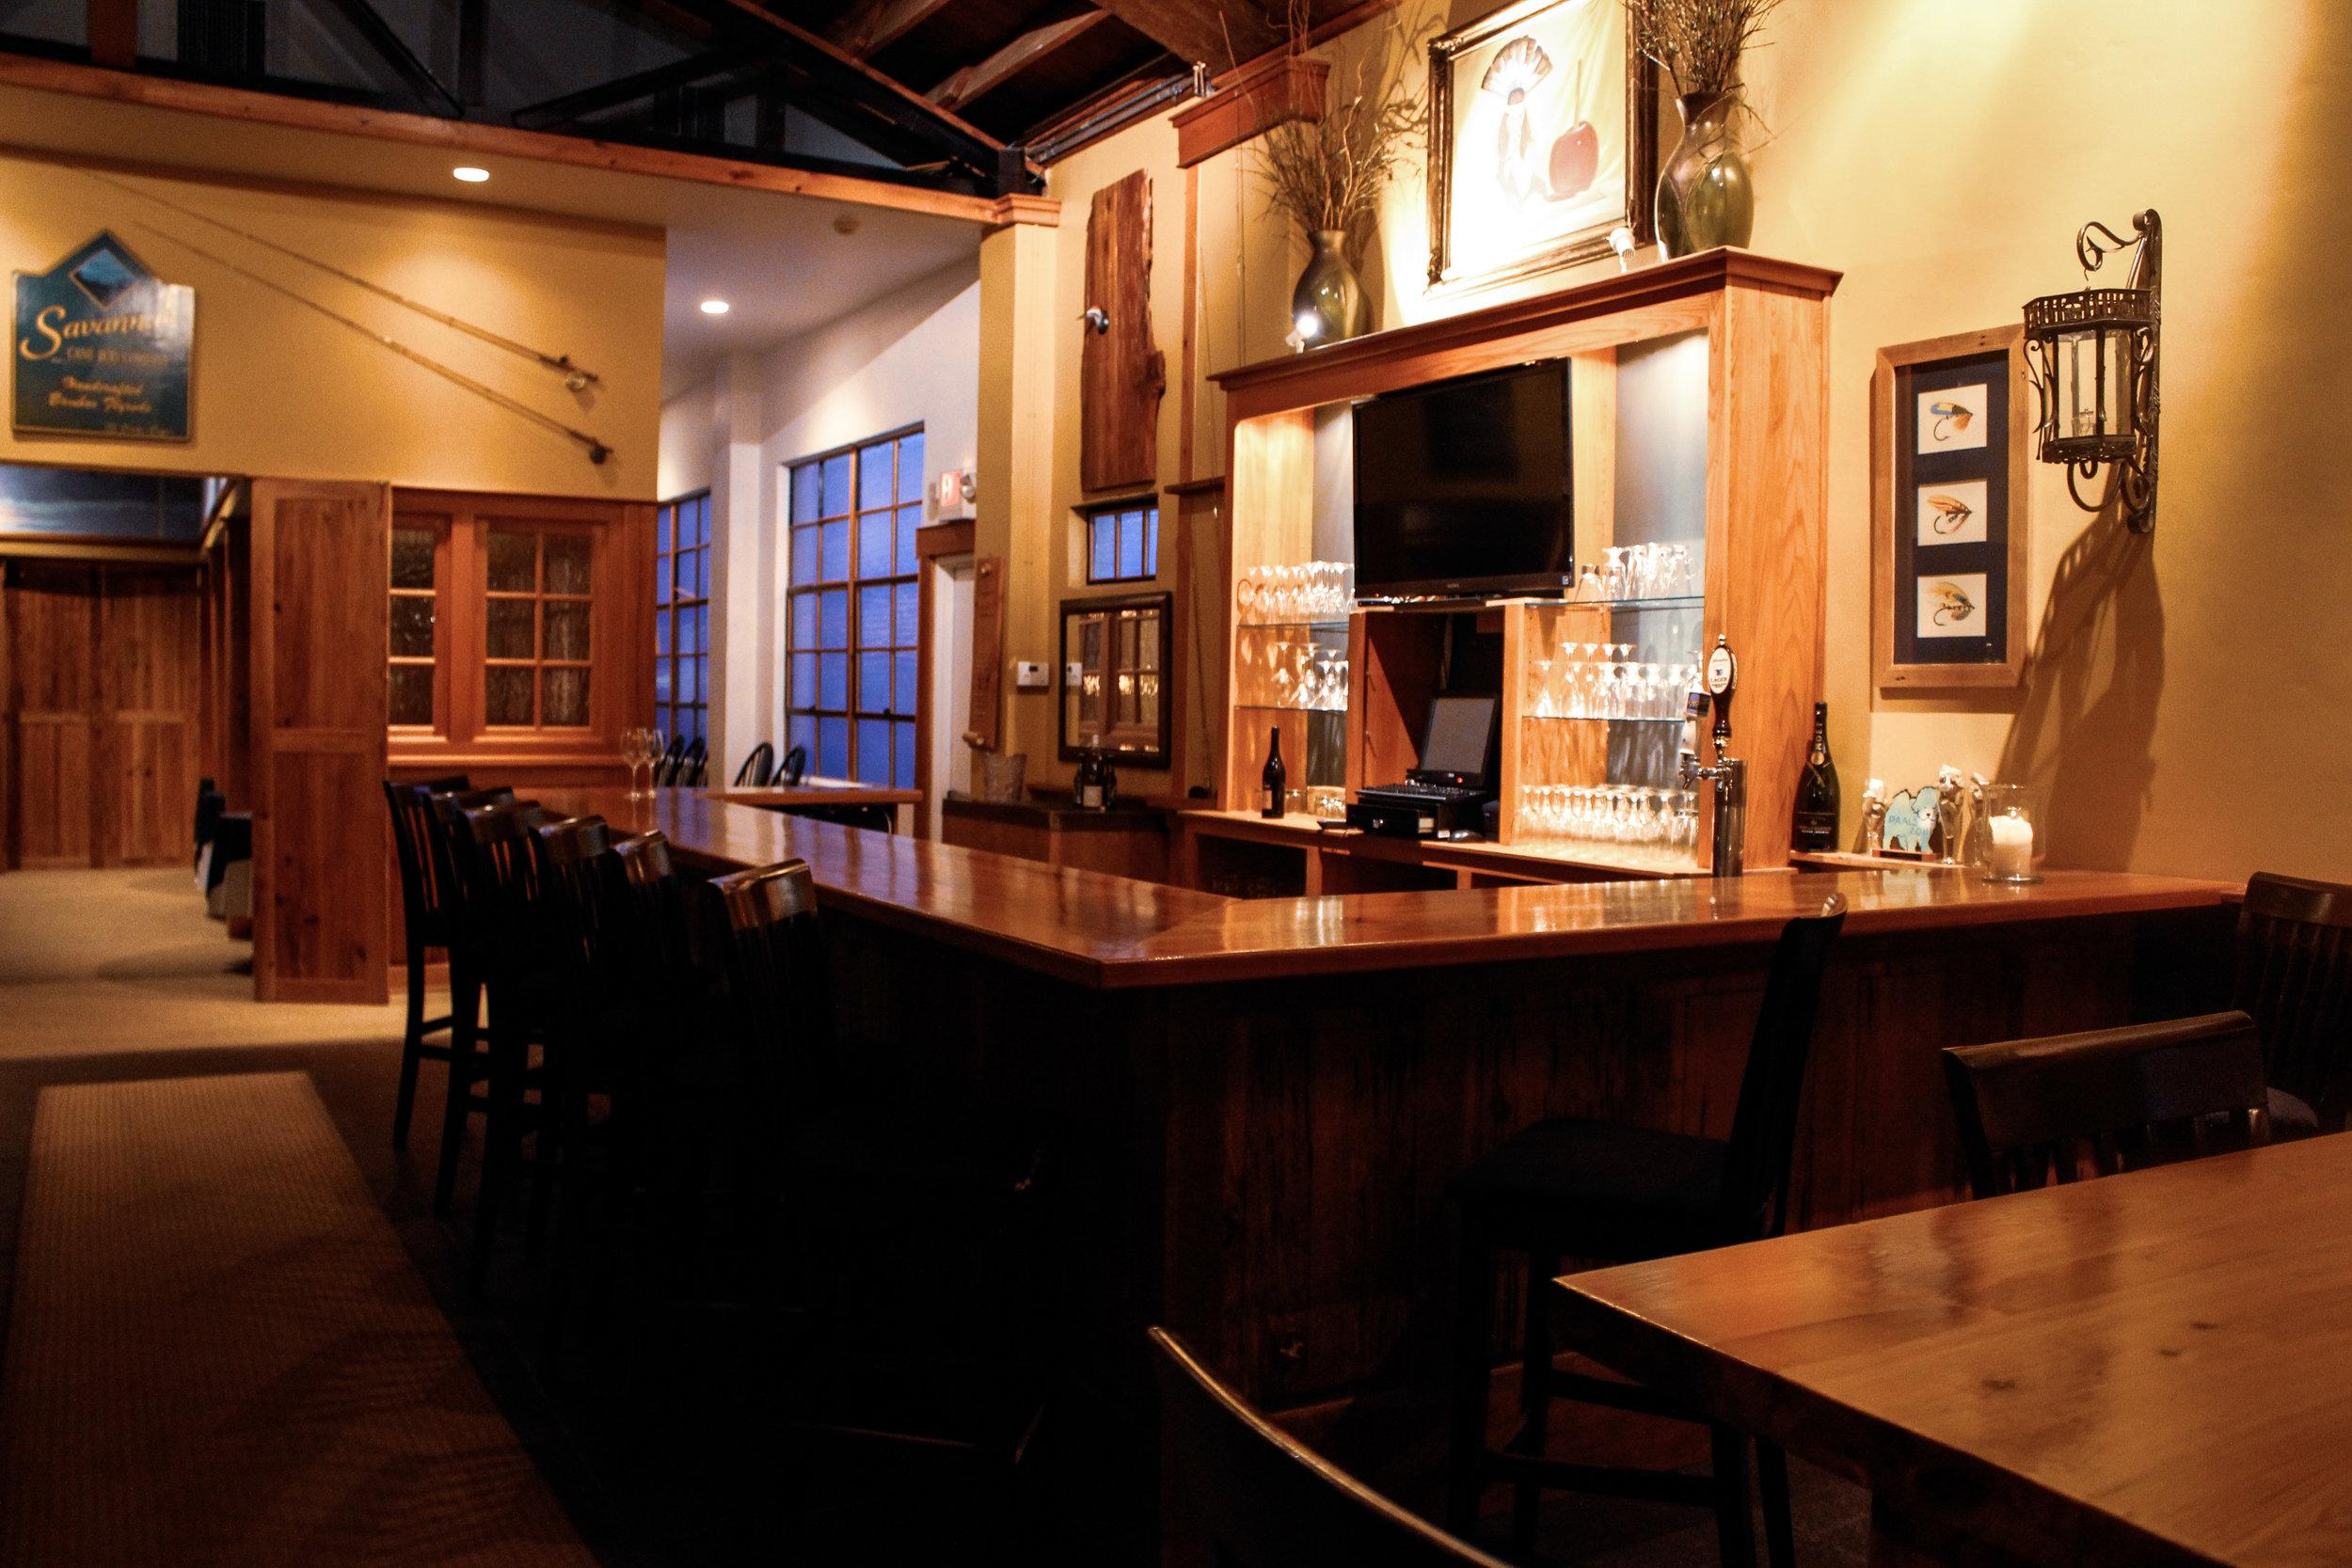 511 Rutledge - Event Venue - View of Bar